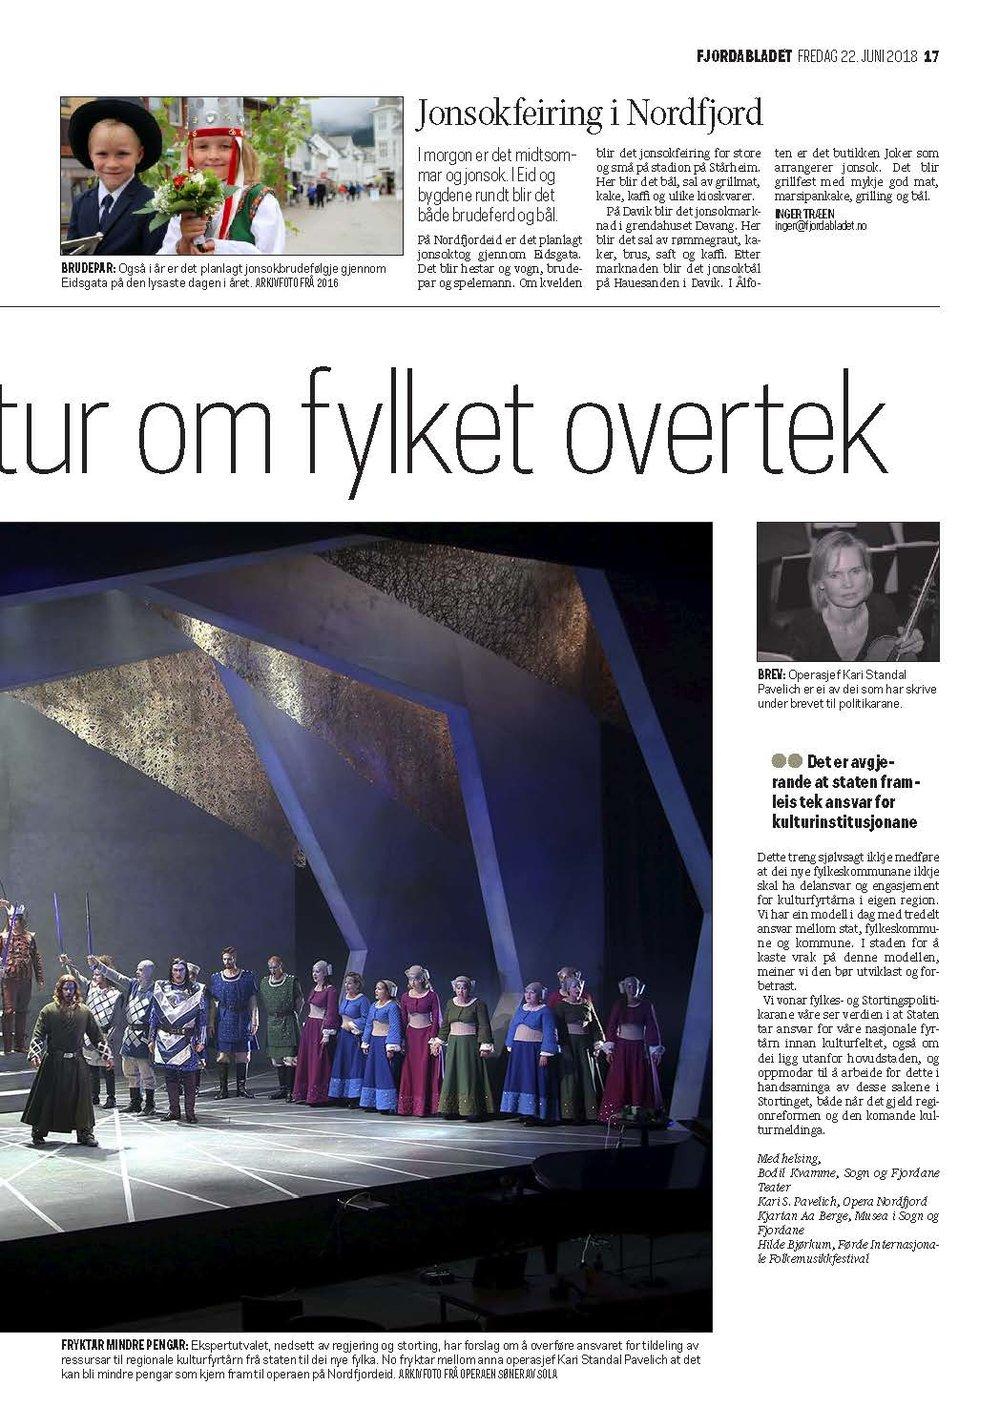 Fjordabladet-2018-06-22-side-17-Kulturmidlar.jpg